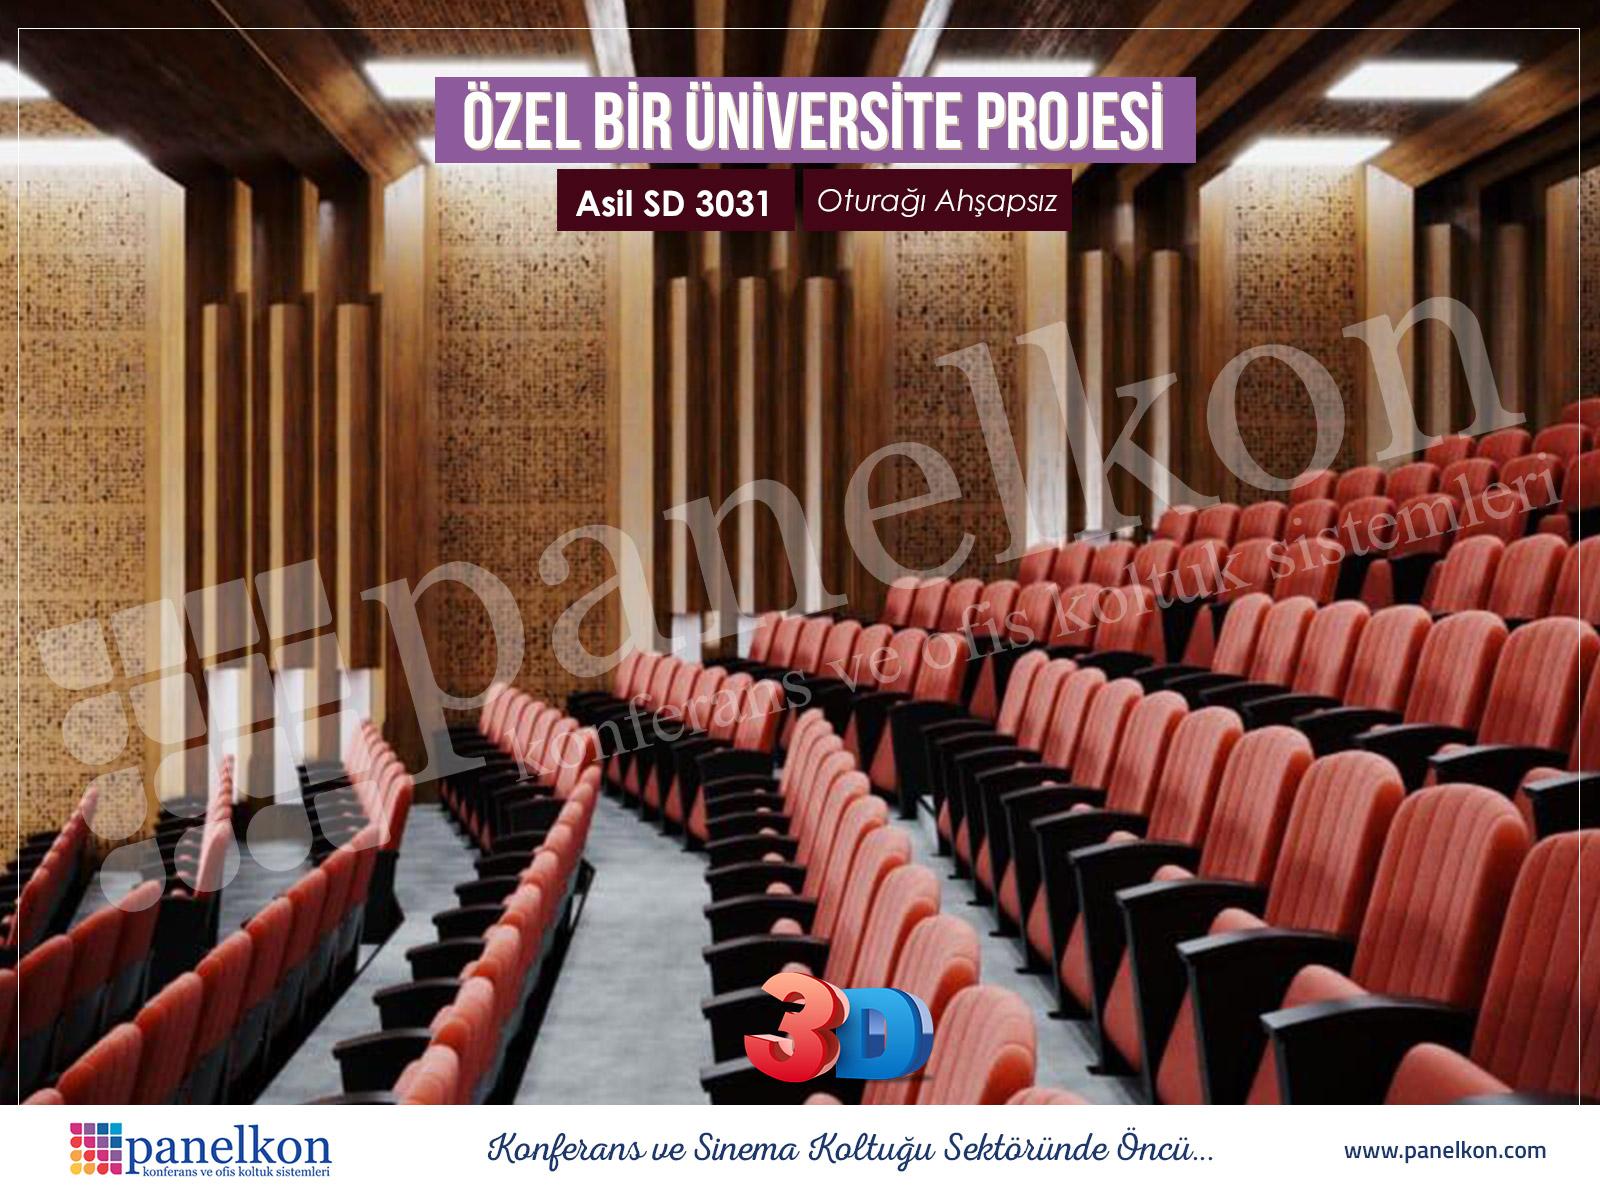 universite-konferans-koltugu-4